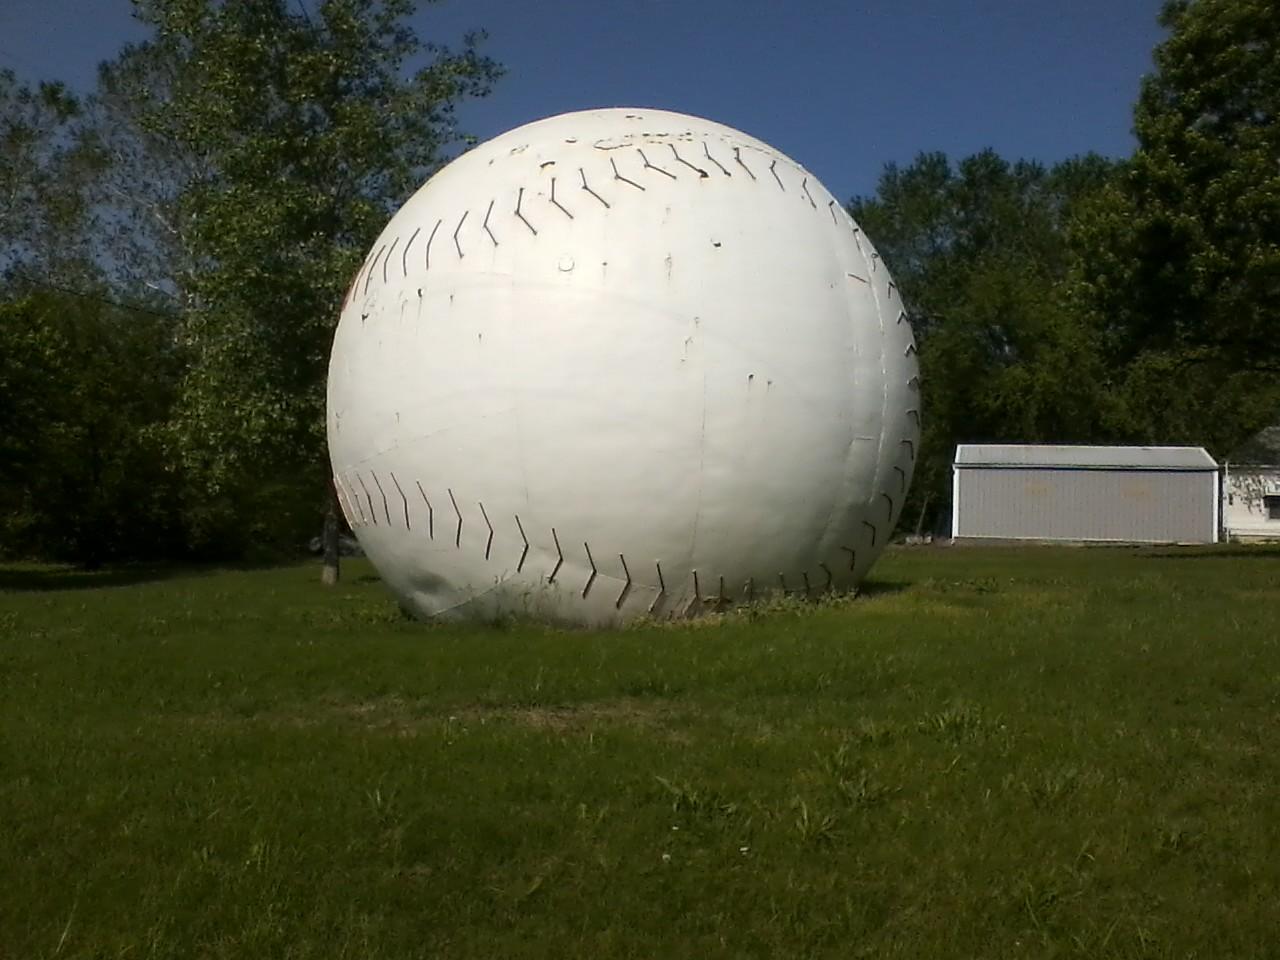 Muscotah World's Largest Baseball